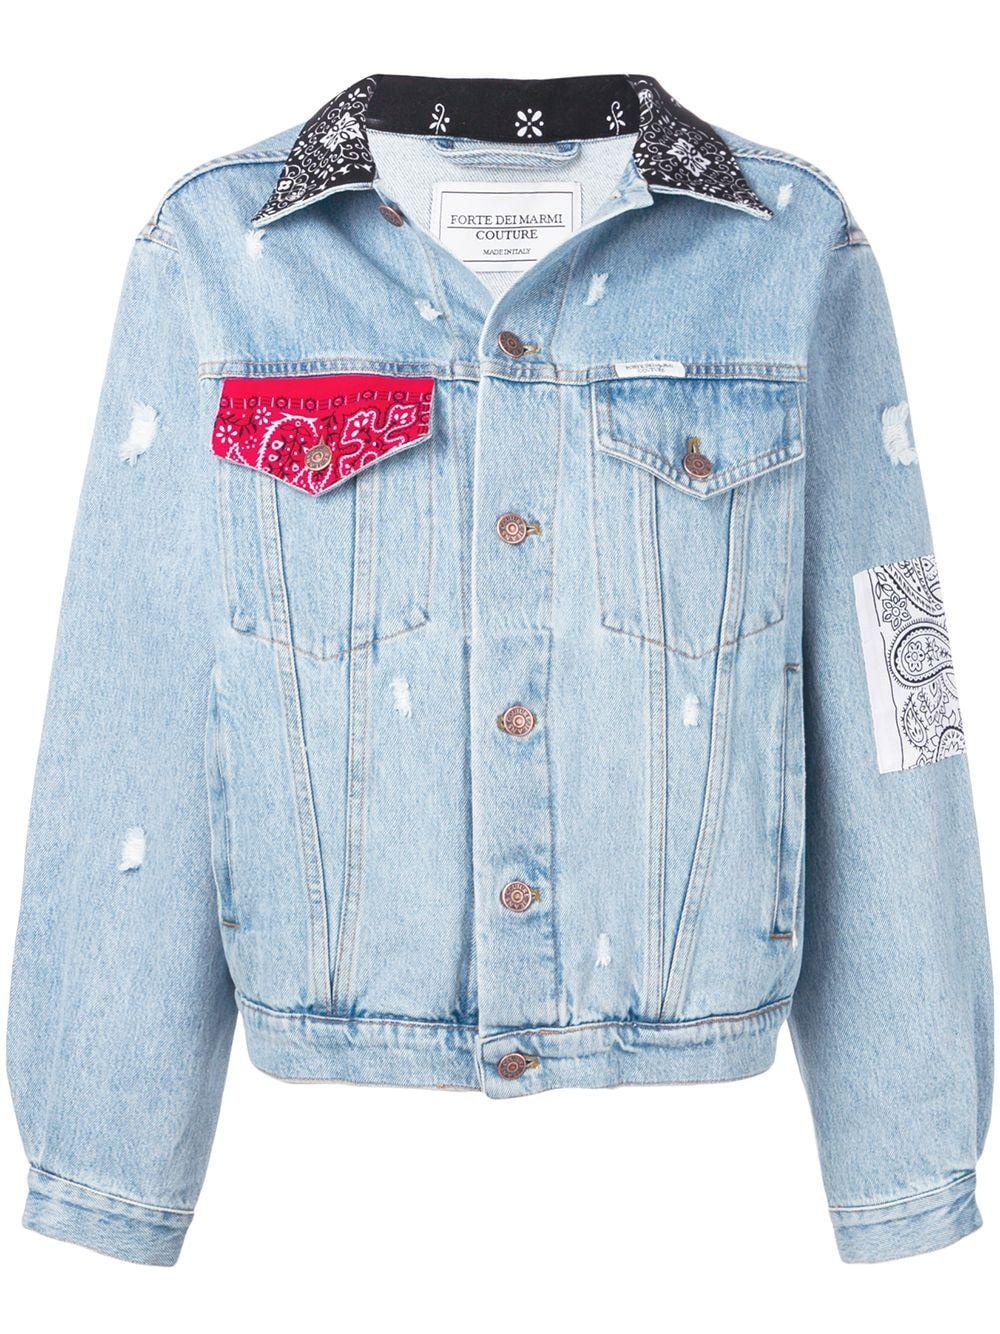 Forte Dei Marmi Couture Bandana Trim Denim Jacket Farfetch Denim Jacket Jackets Denim [ 1334 x 1000 Pixel ]